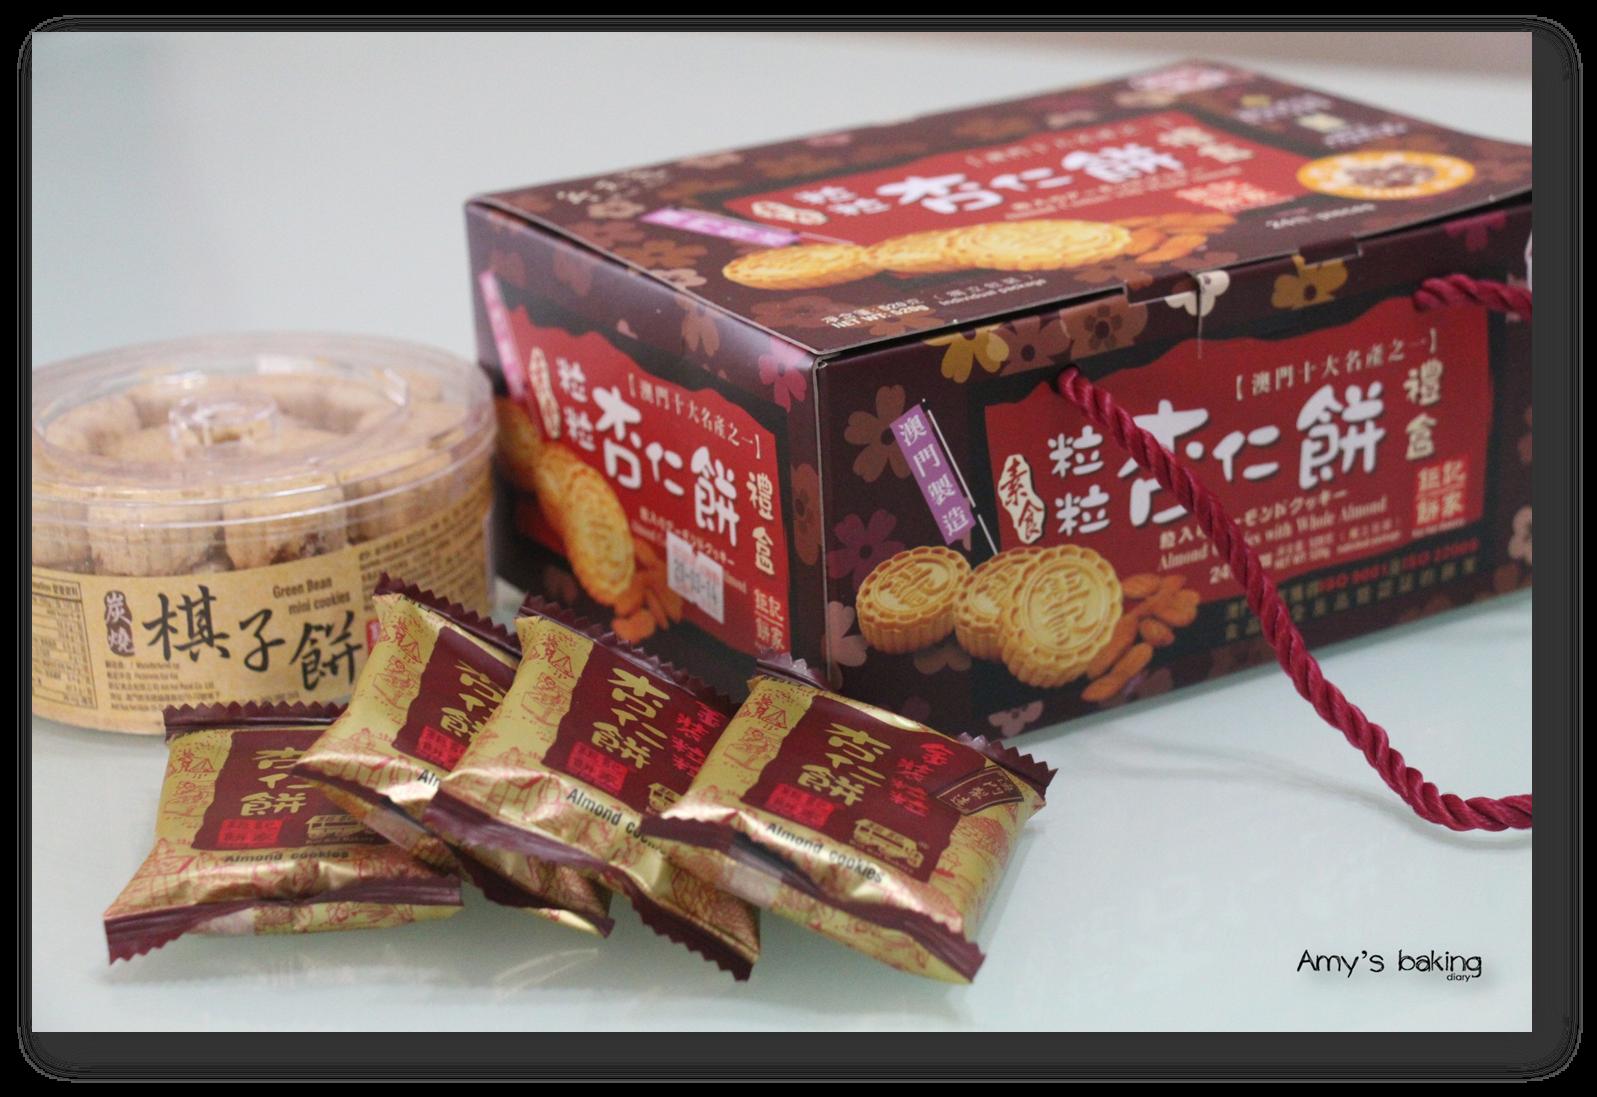 Almond Cookies Macau Macanese Almond Cookies 杏仁饼